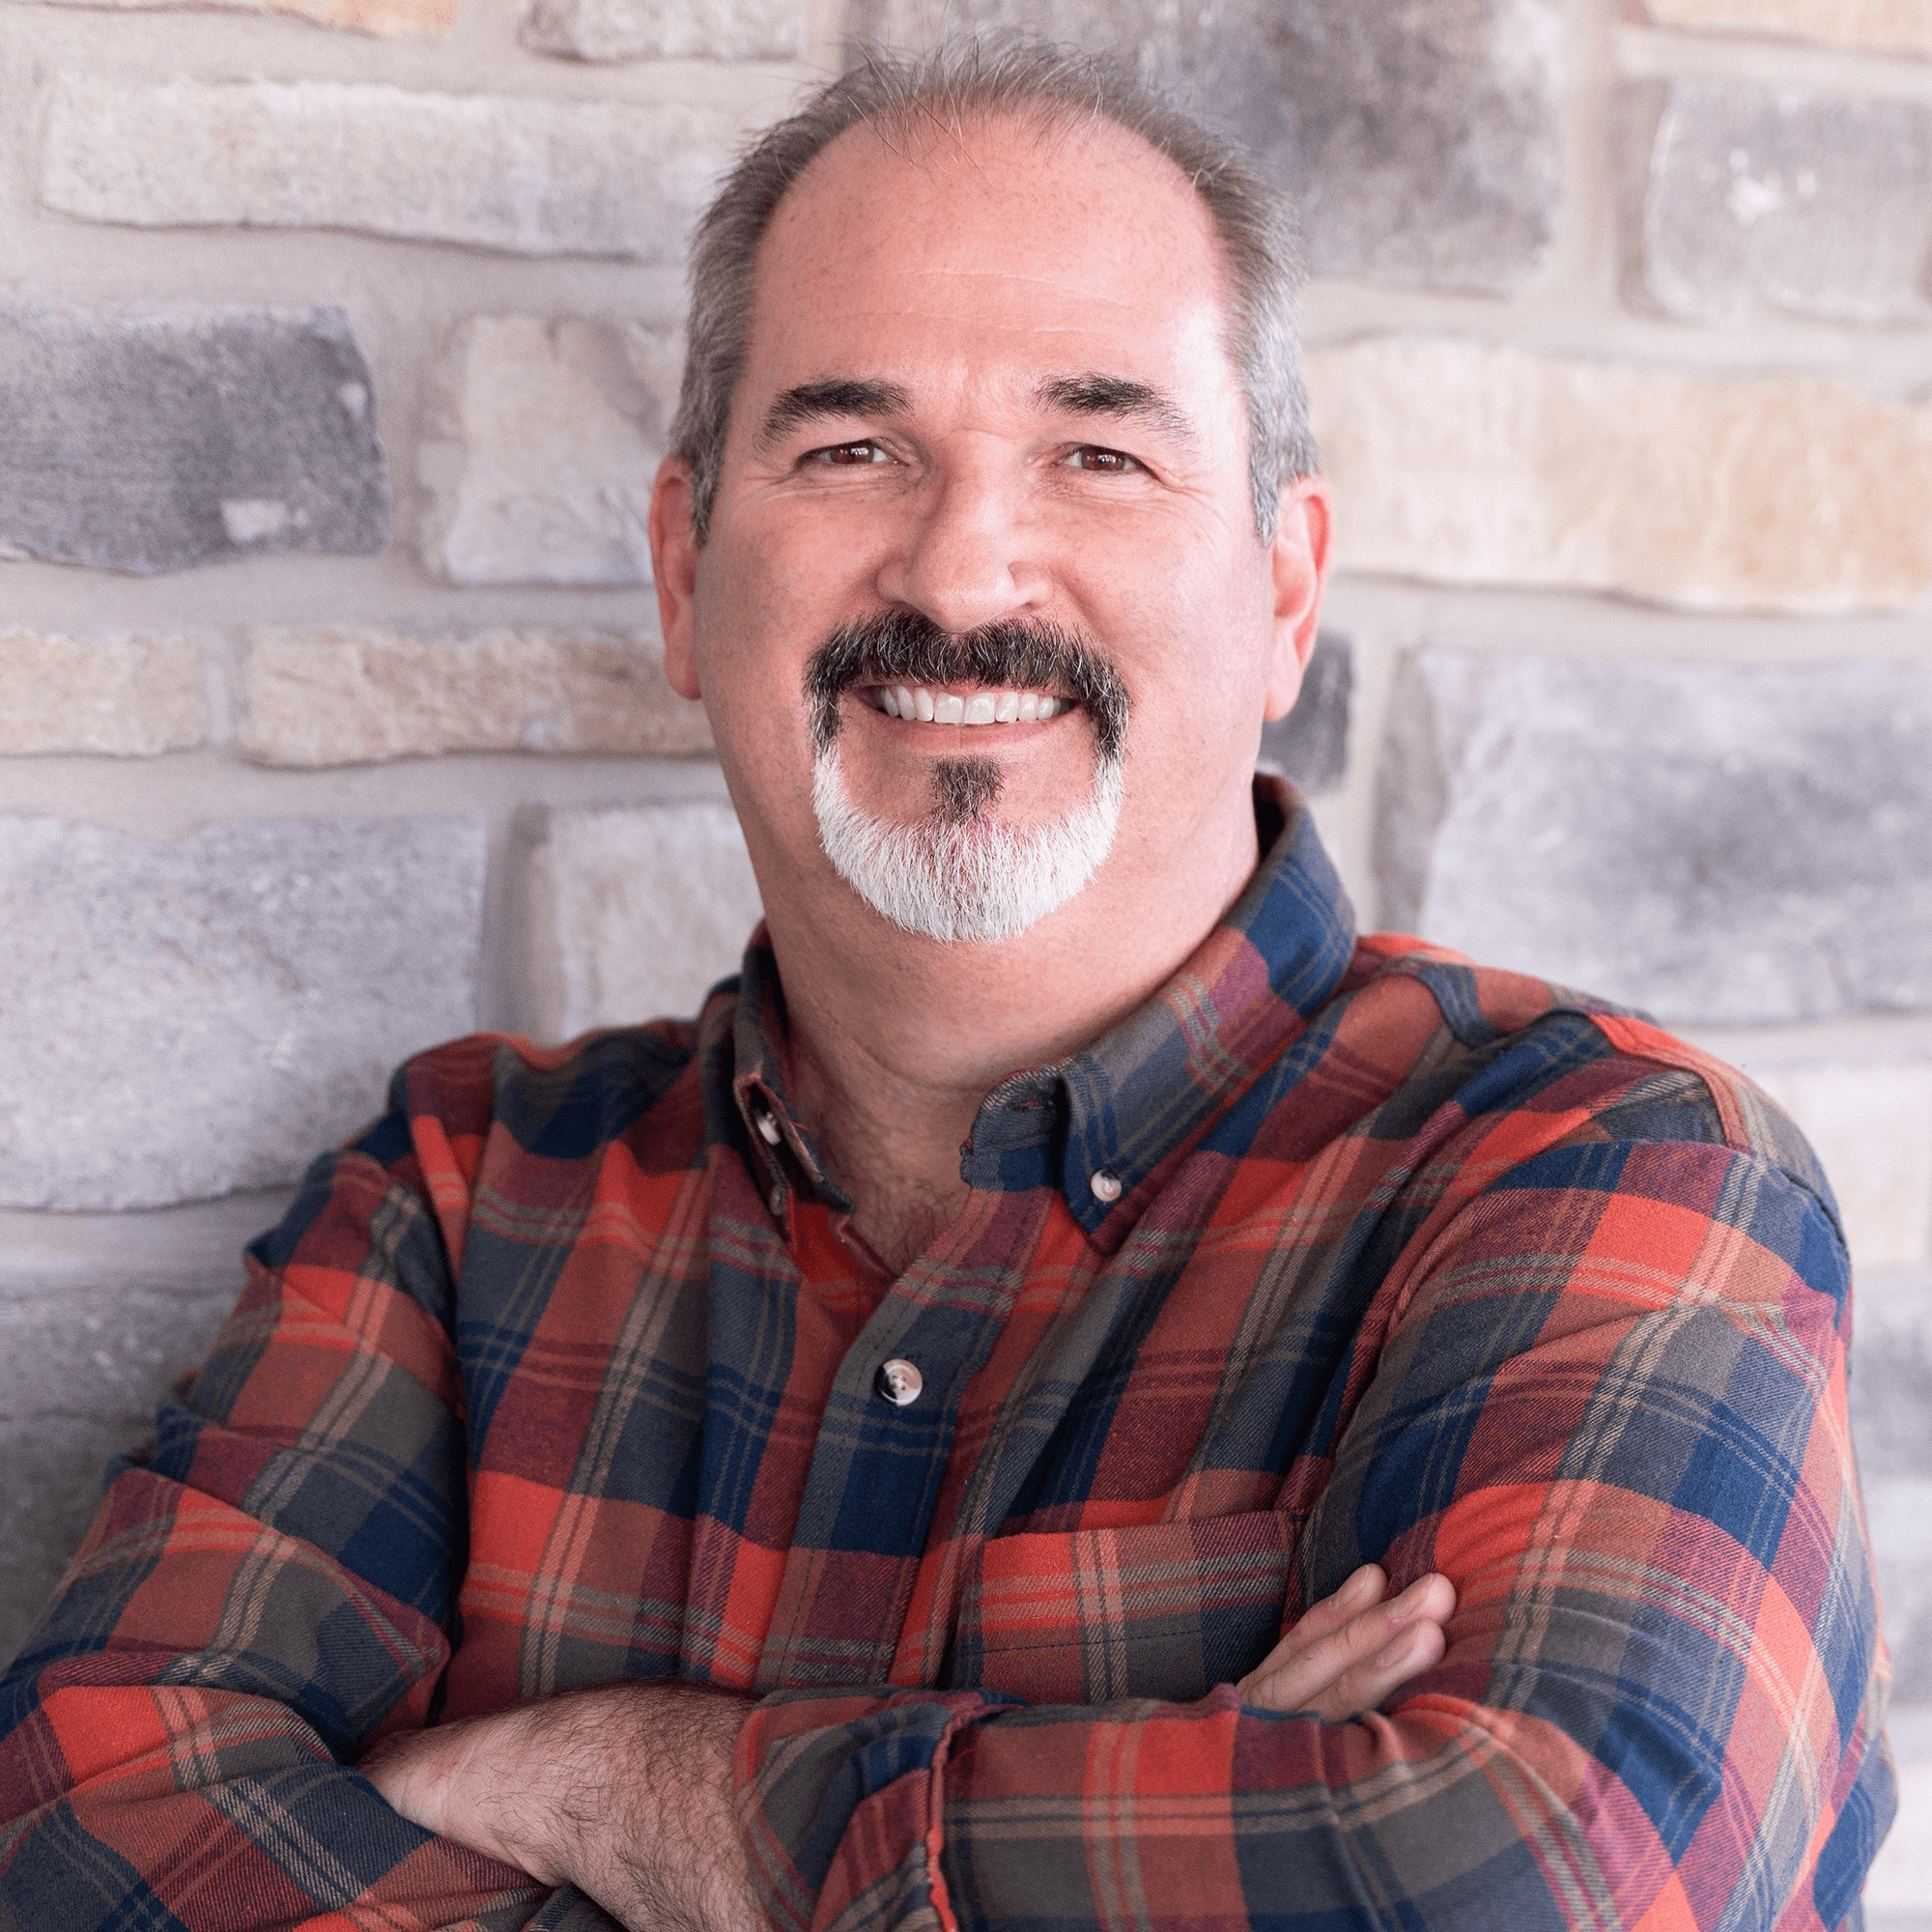 Greg Perkins